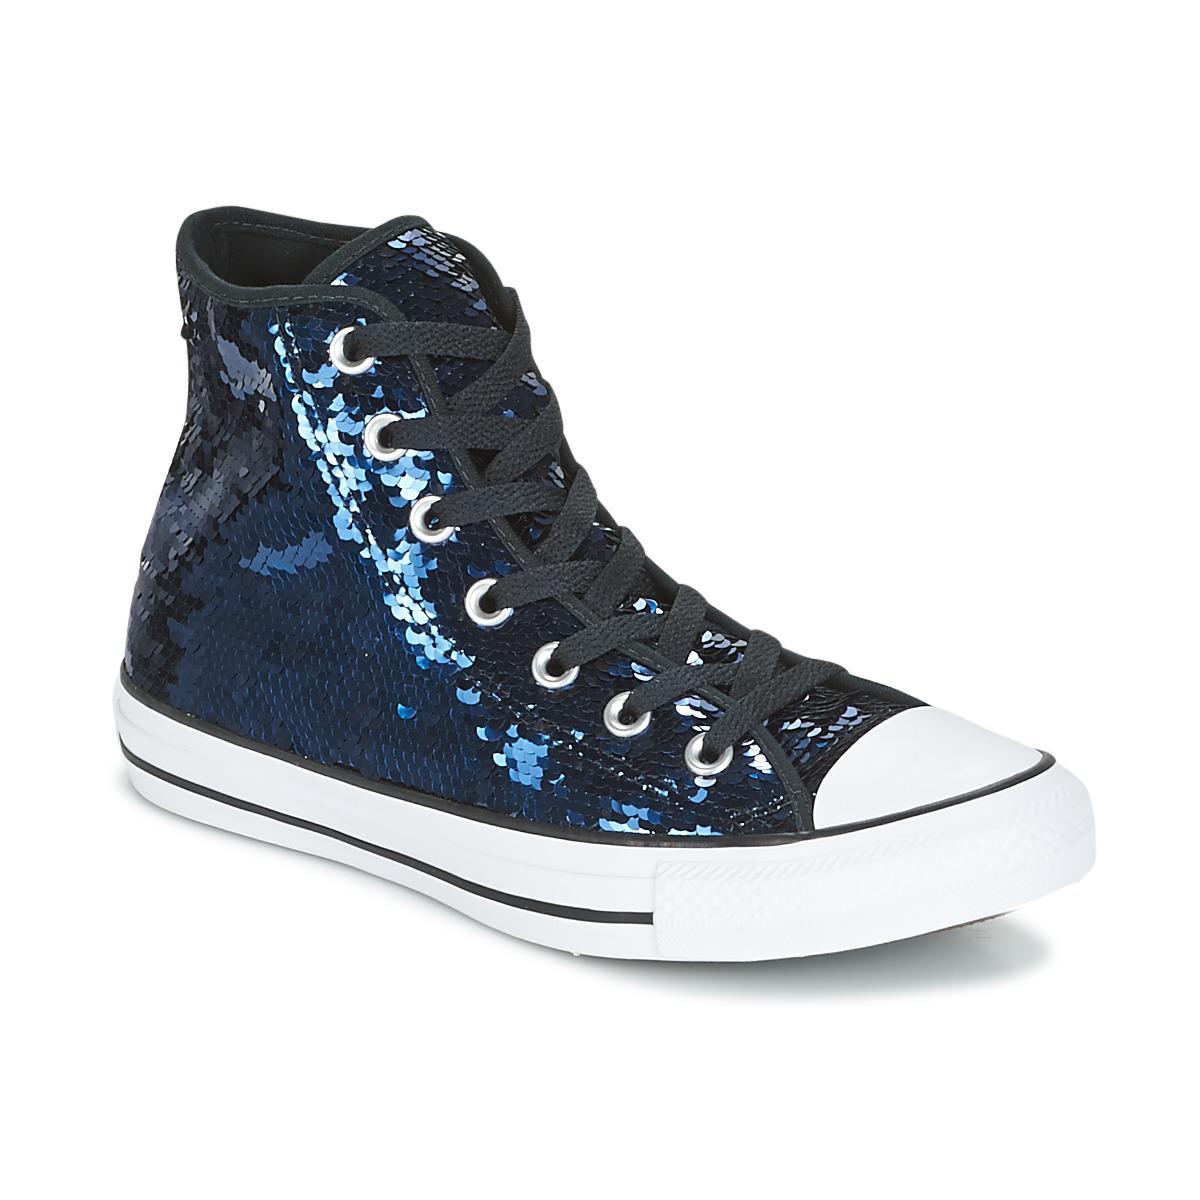 888e929d8276 Converse Chuck Taylor All Star Sequins Hi Midnight Indigo black ...